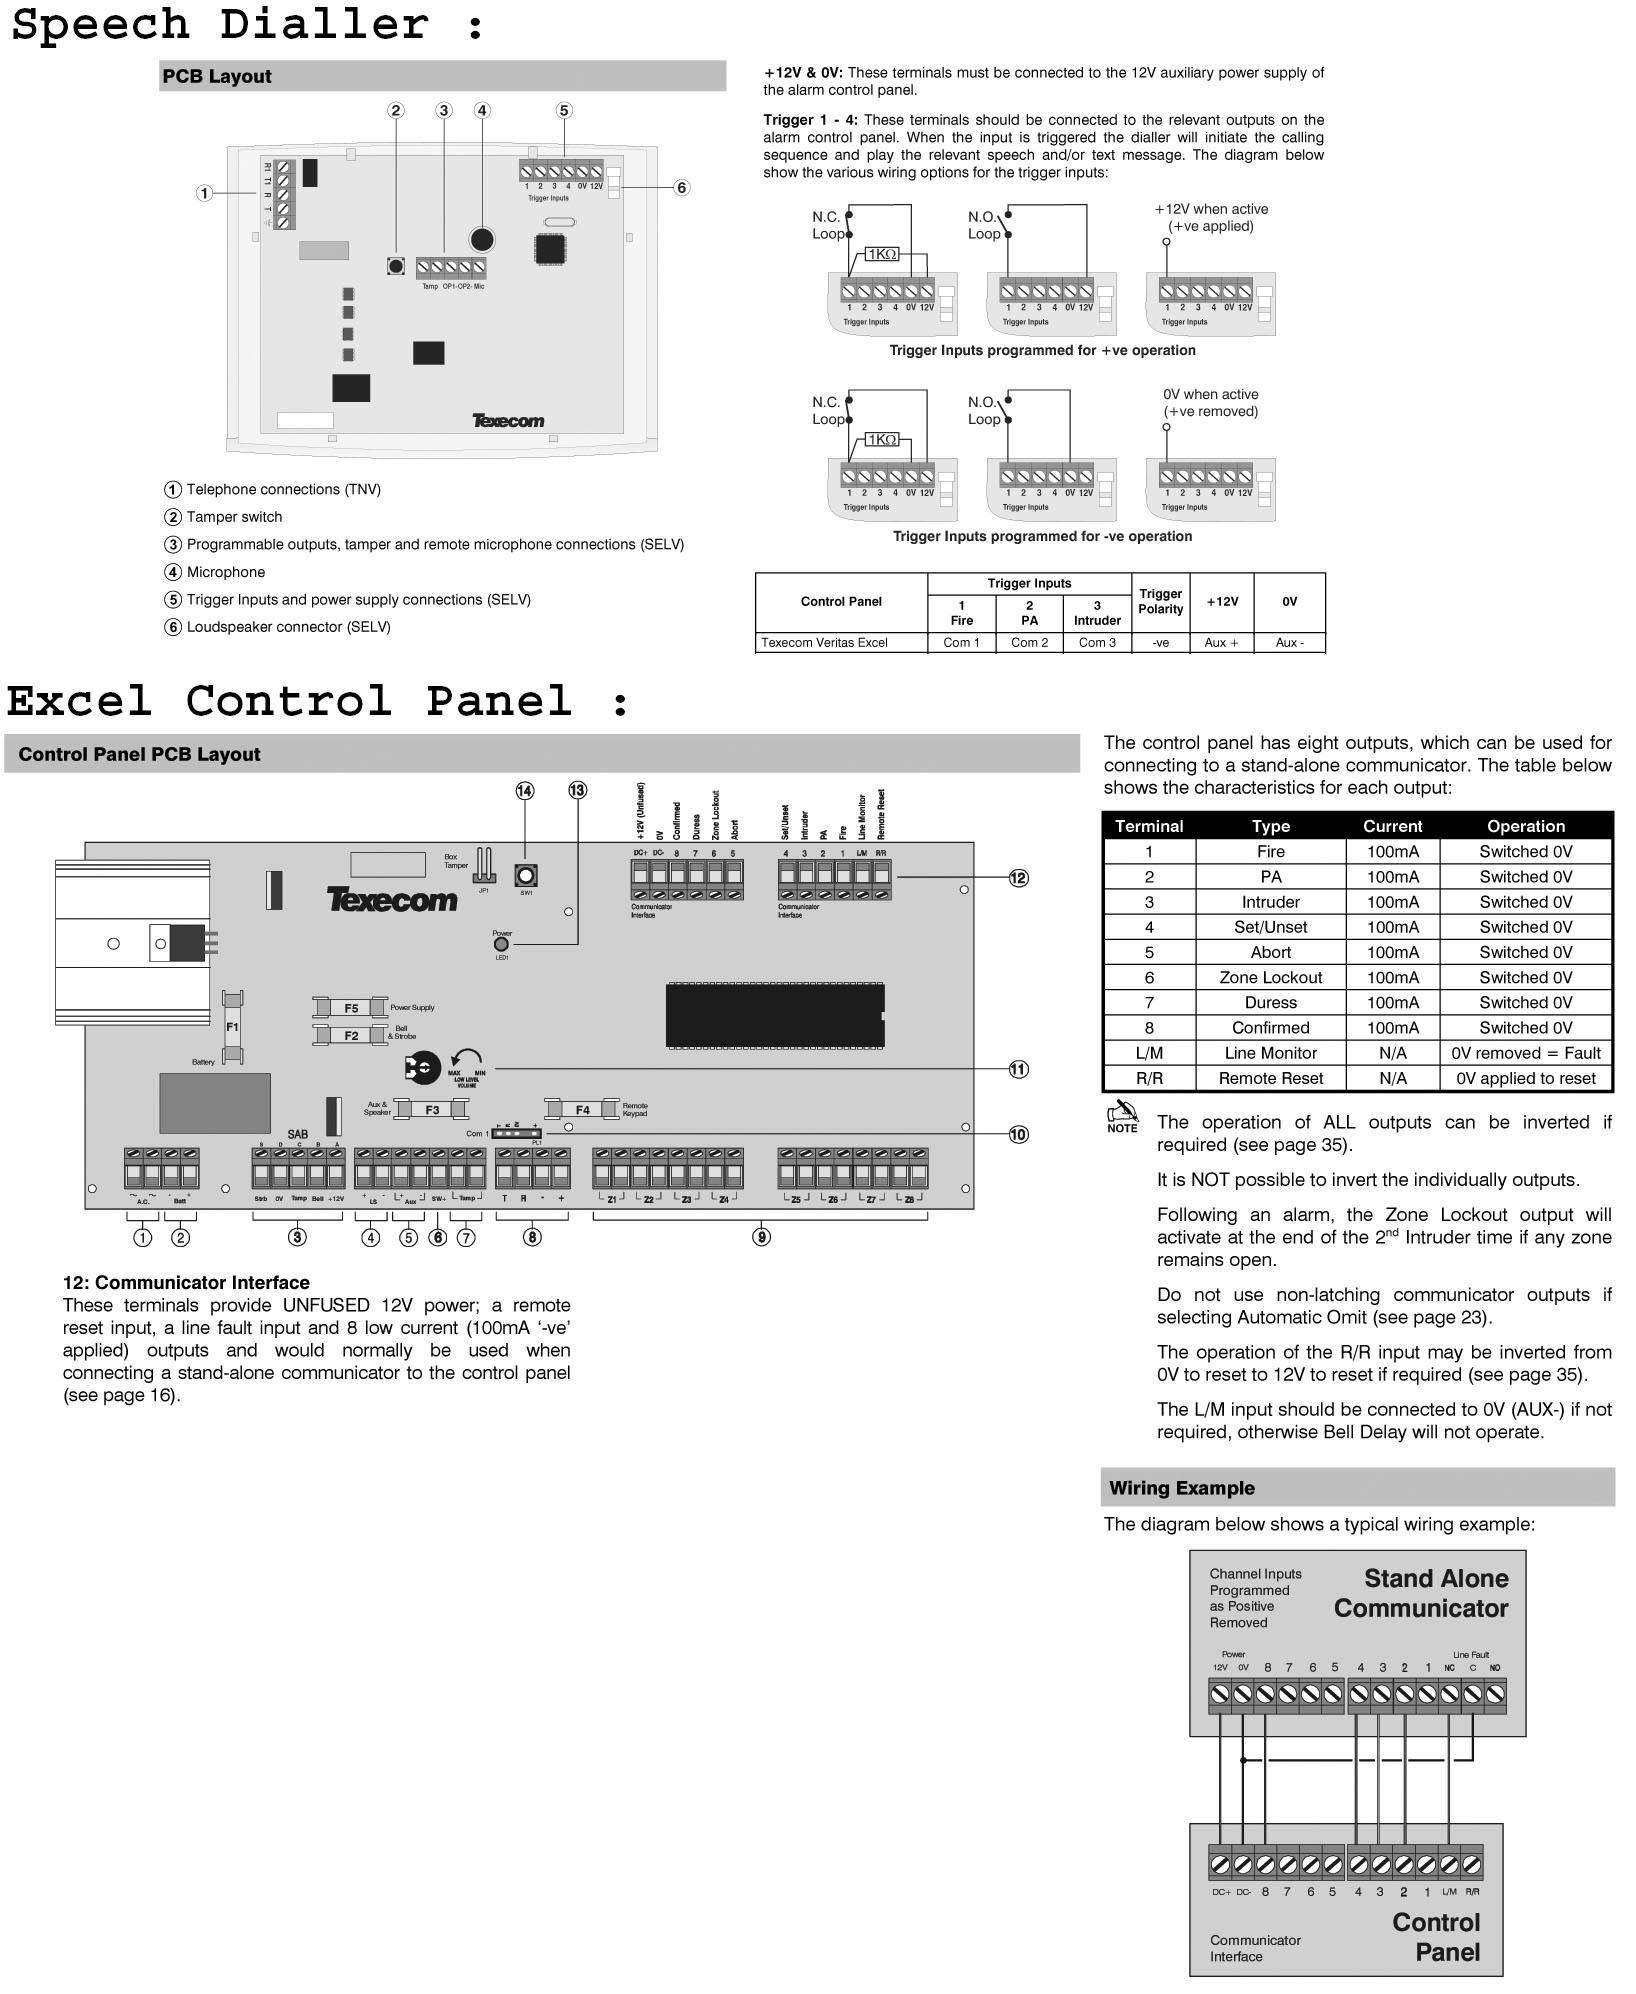 Texecom Excel   Dialler Connectioni Want - Control Panels  Public